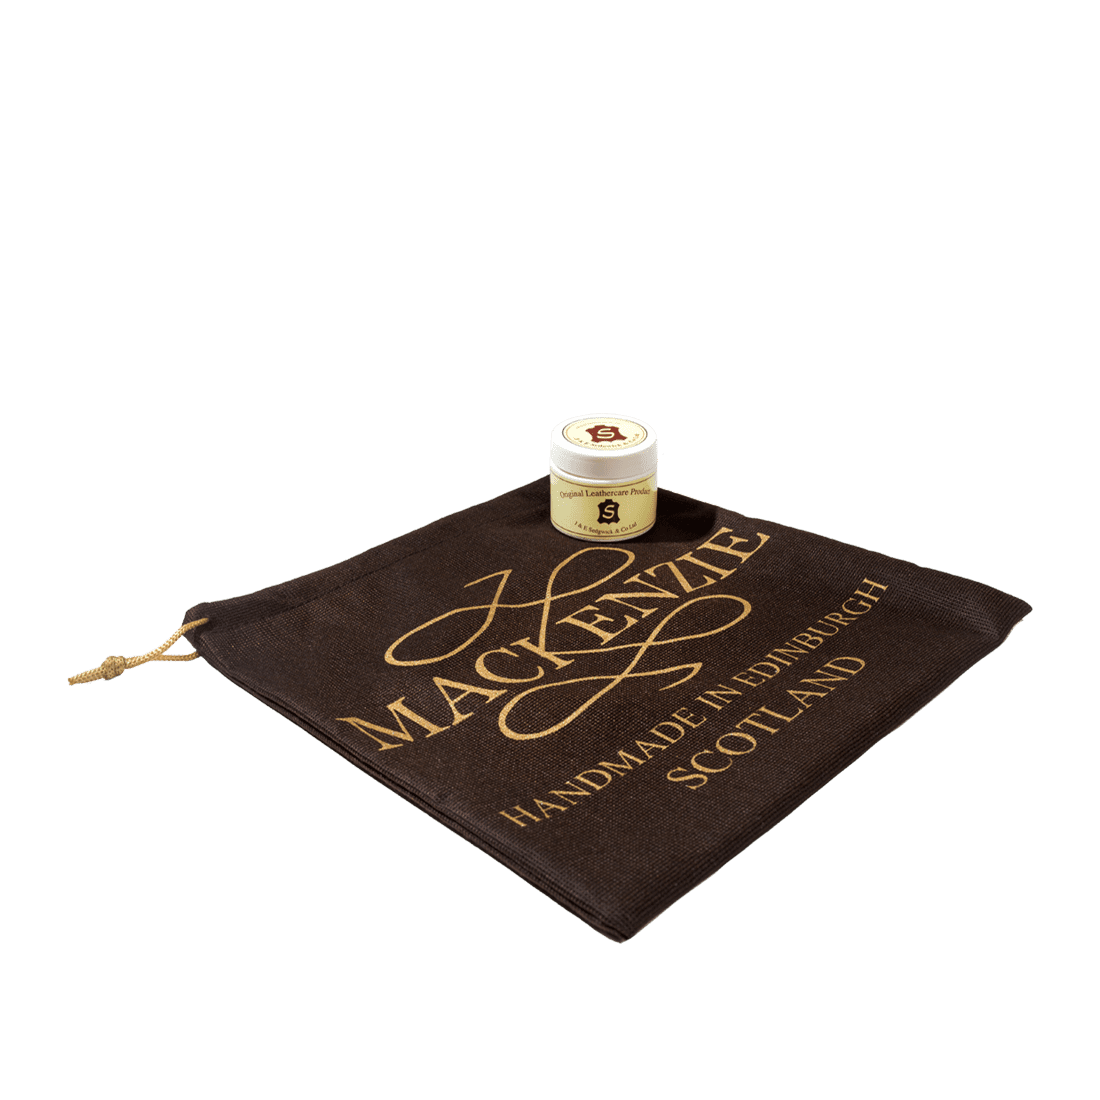 Small leather cream care & dustbag